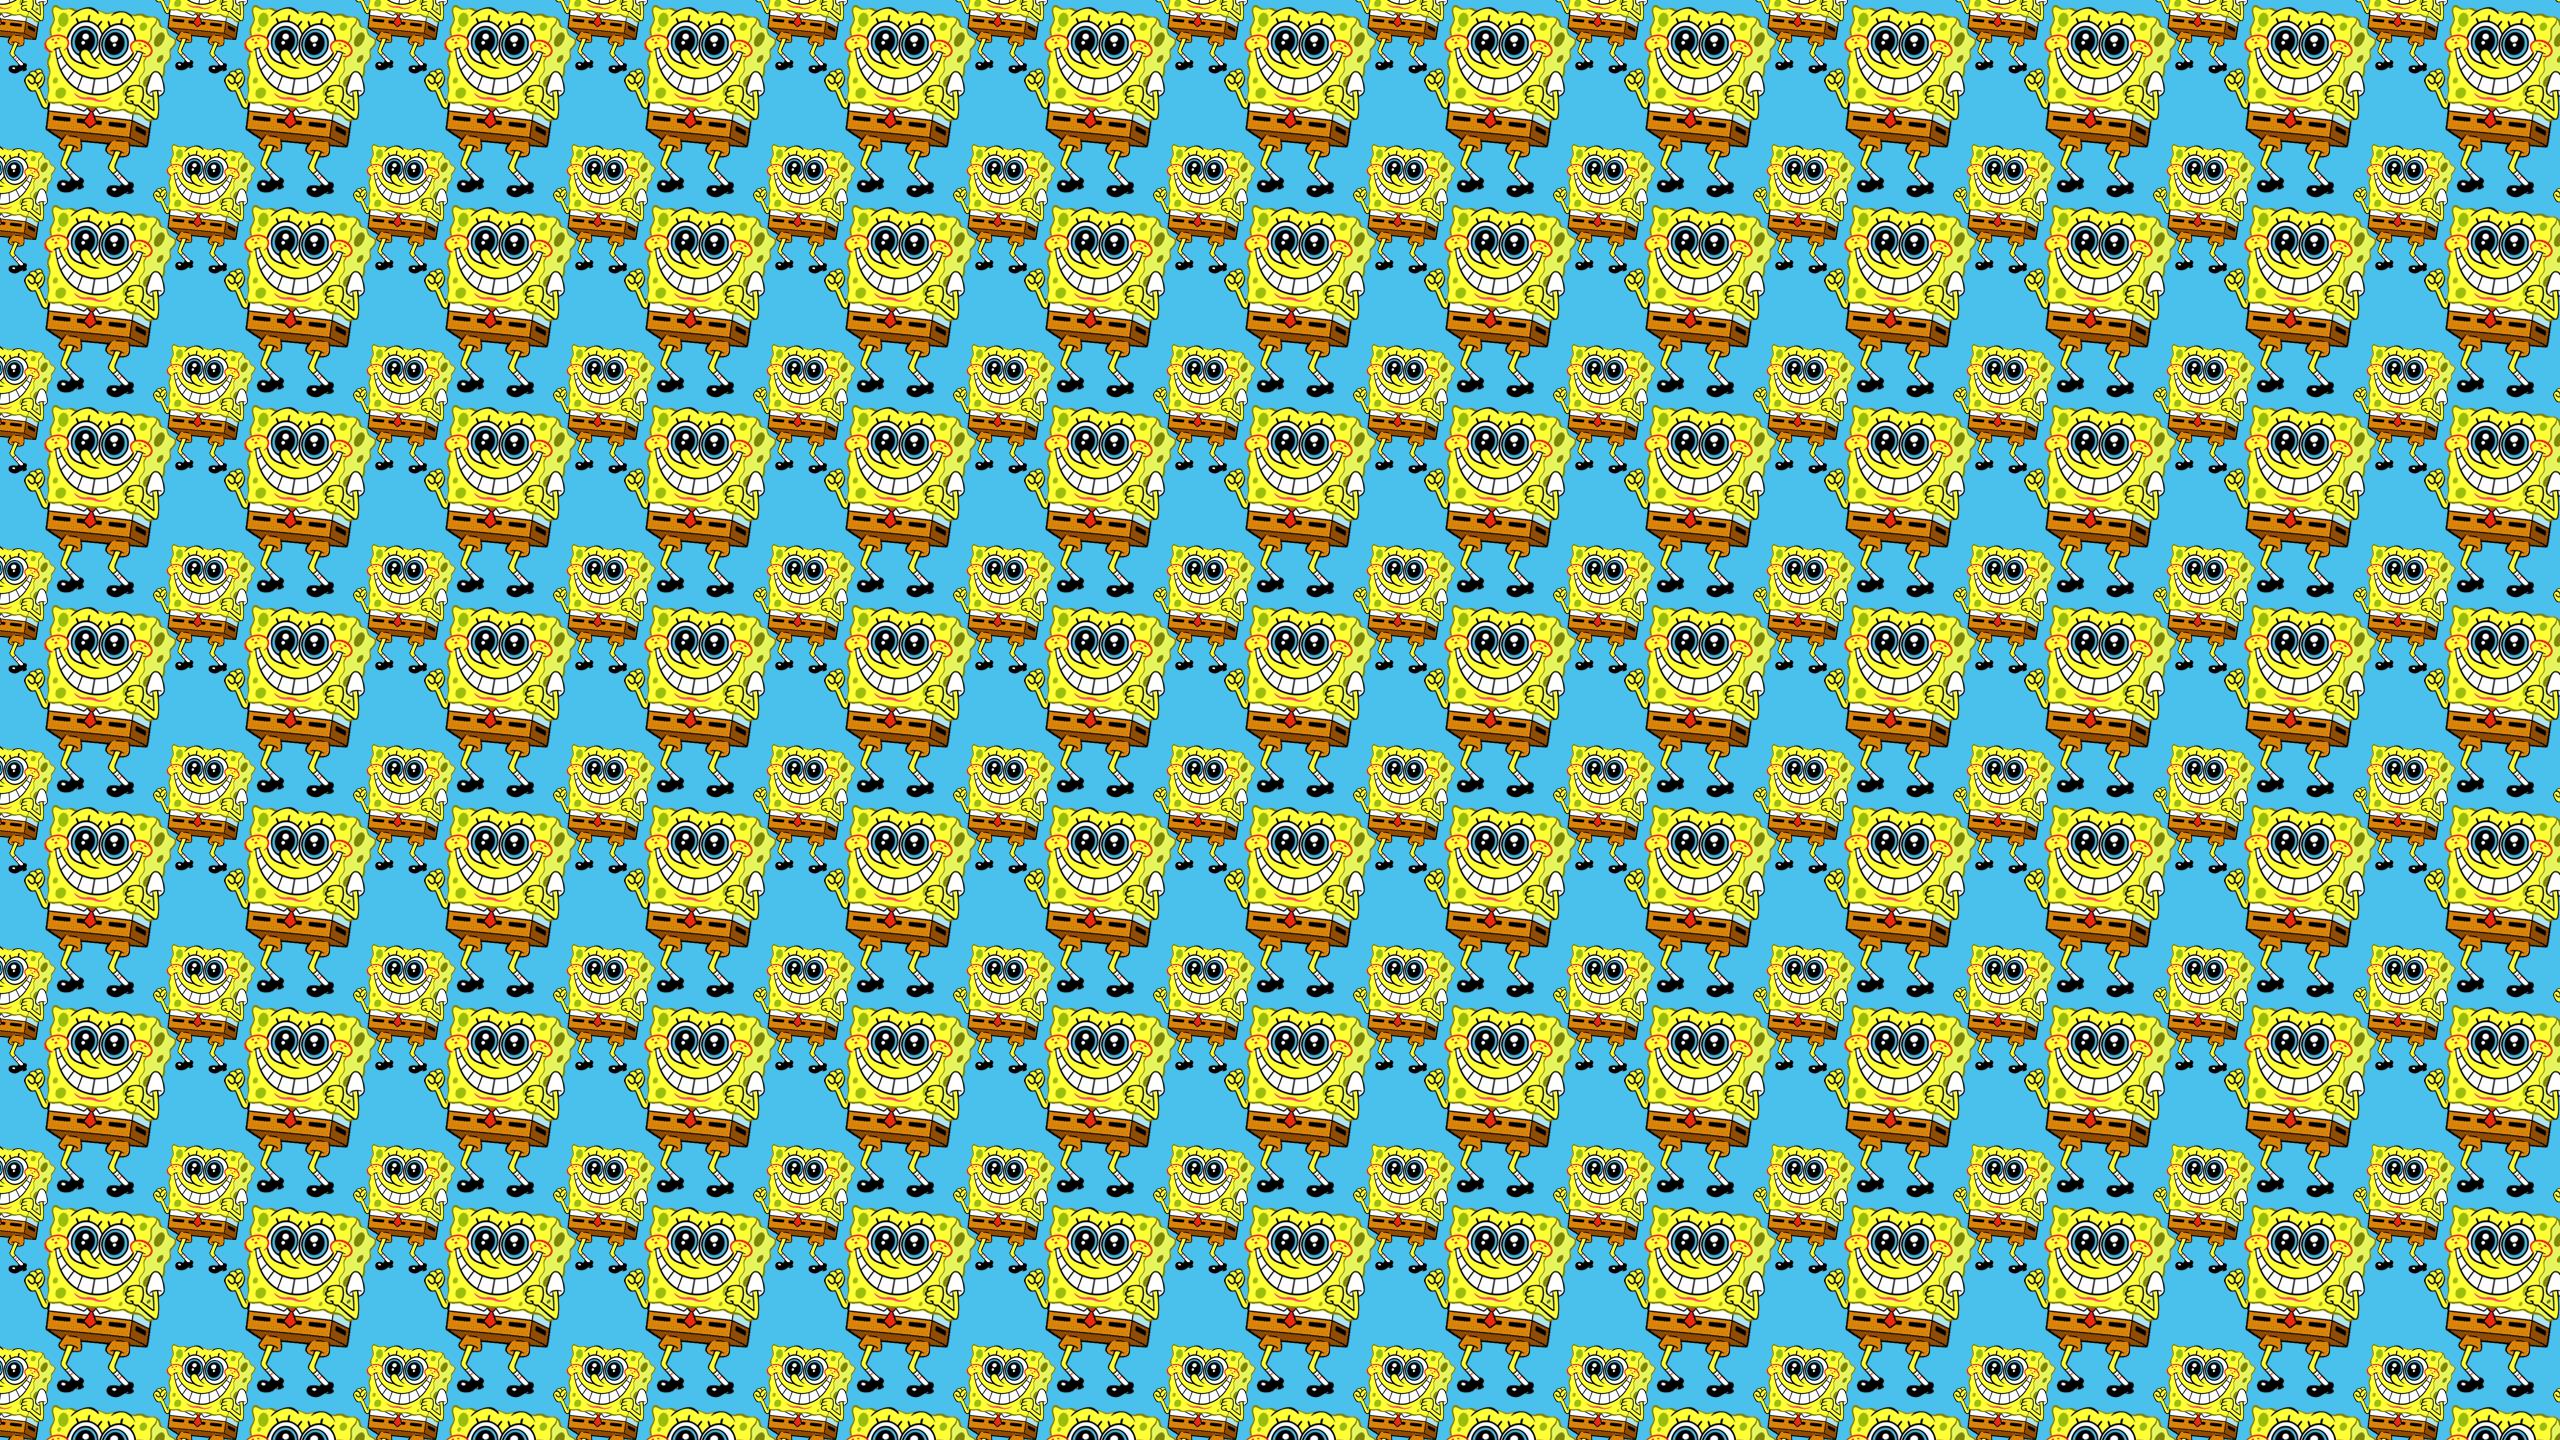 wallpaper installing this spongebob square pants desktop wallpaper is 2560x1440